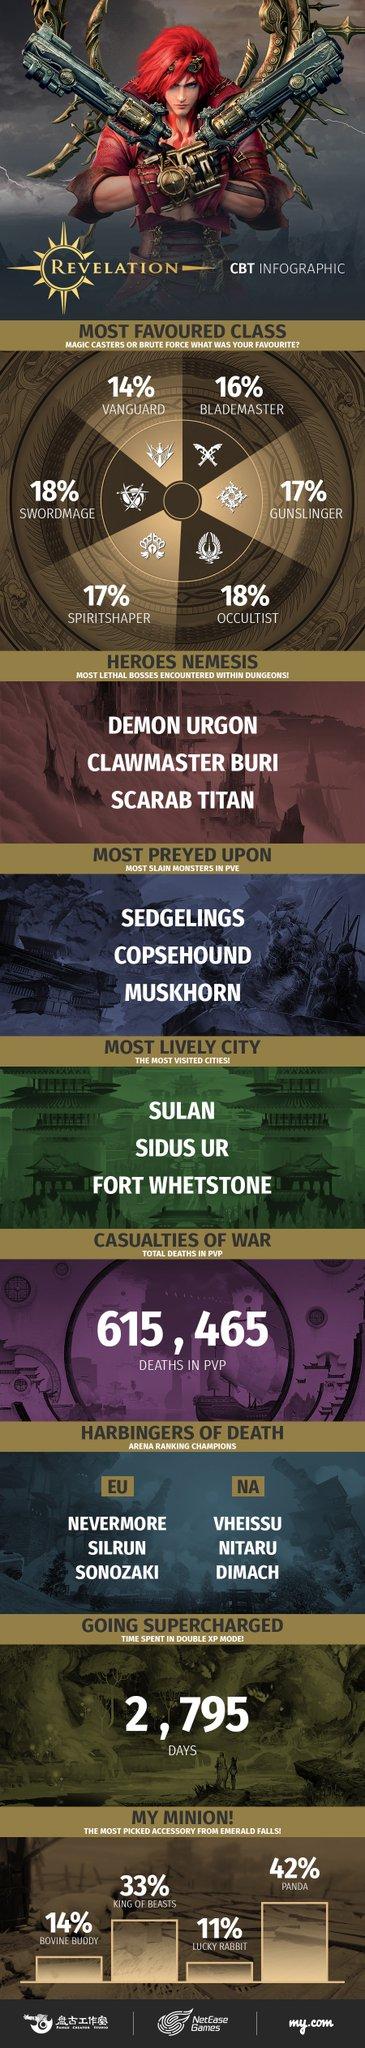 revelation online infographic